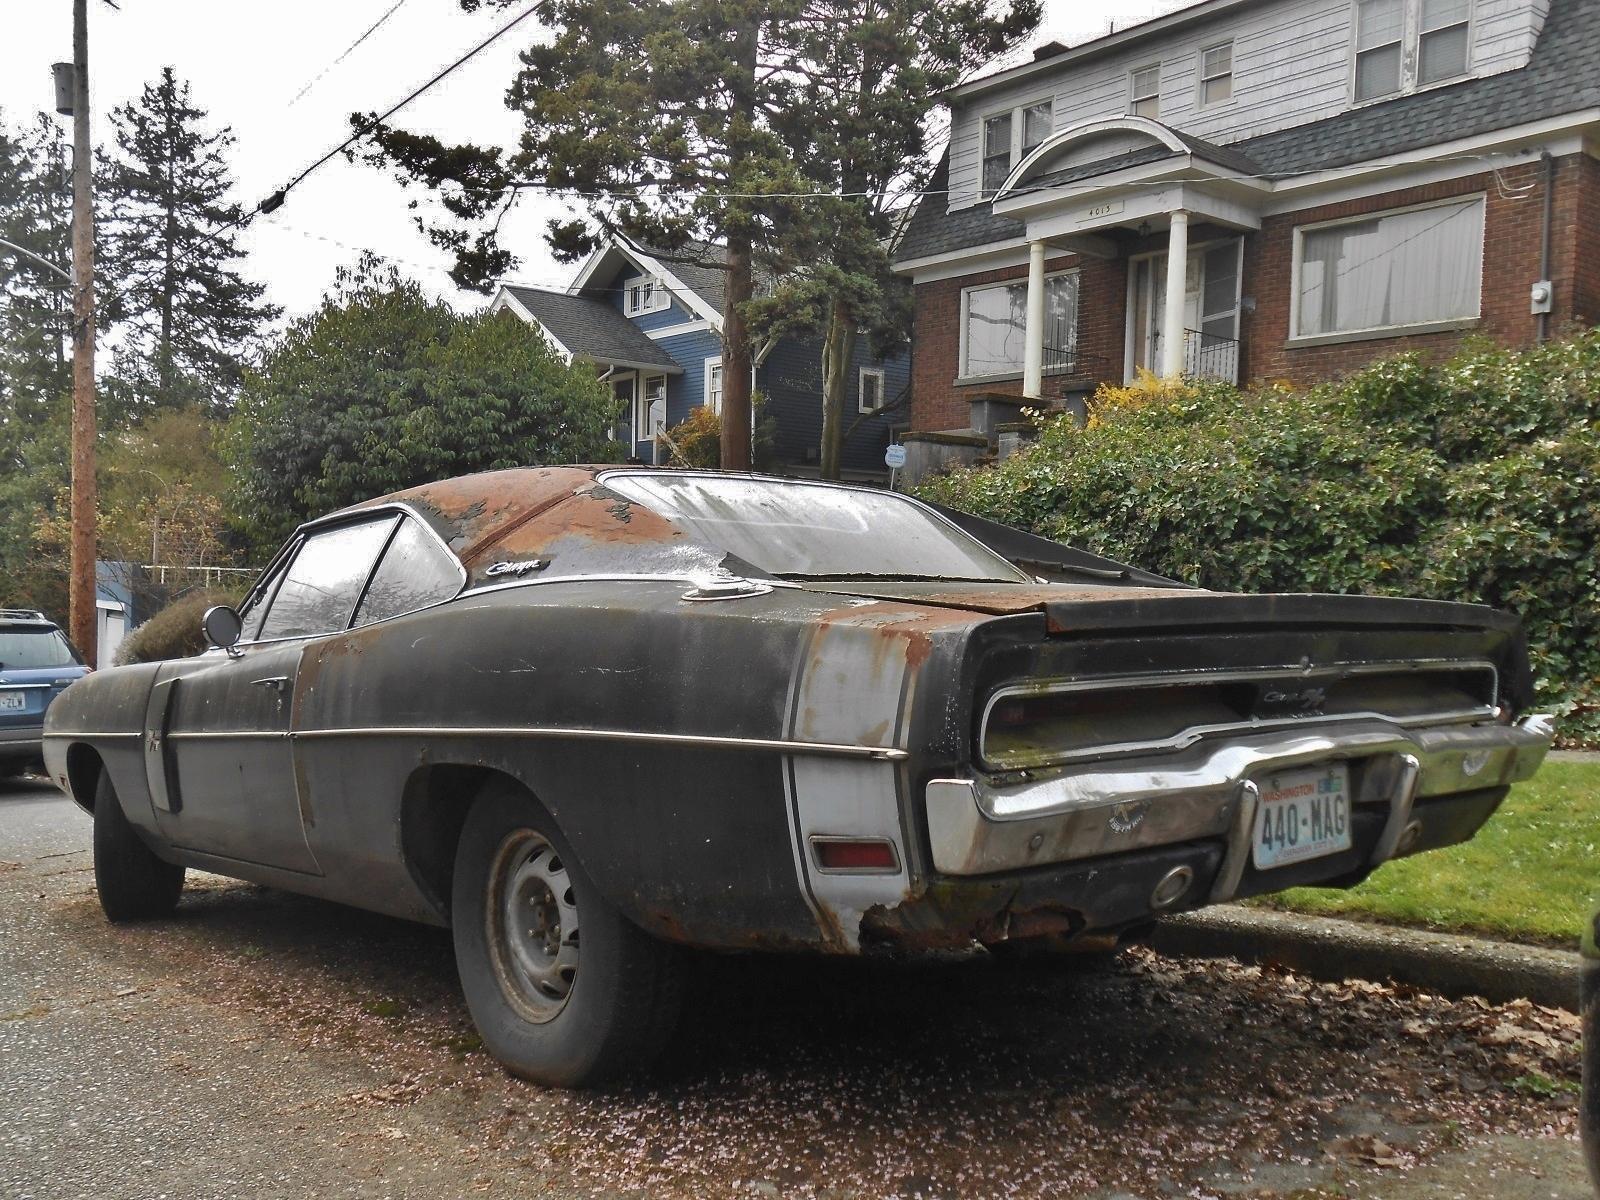 seattle 39 s parked cars 1970 dodge charger r t. Black Bedroom Furniture Sets. Home Design Ideas